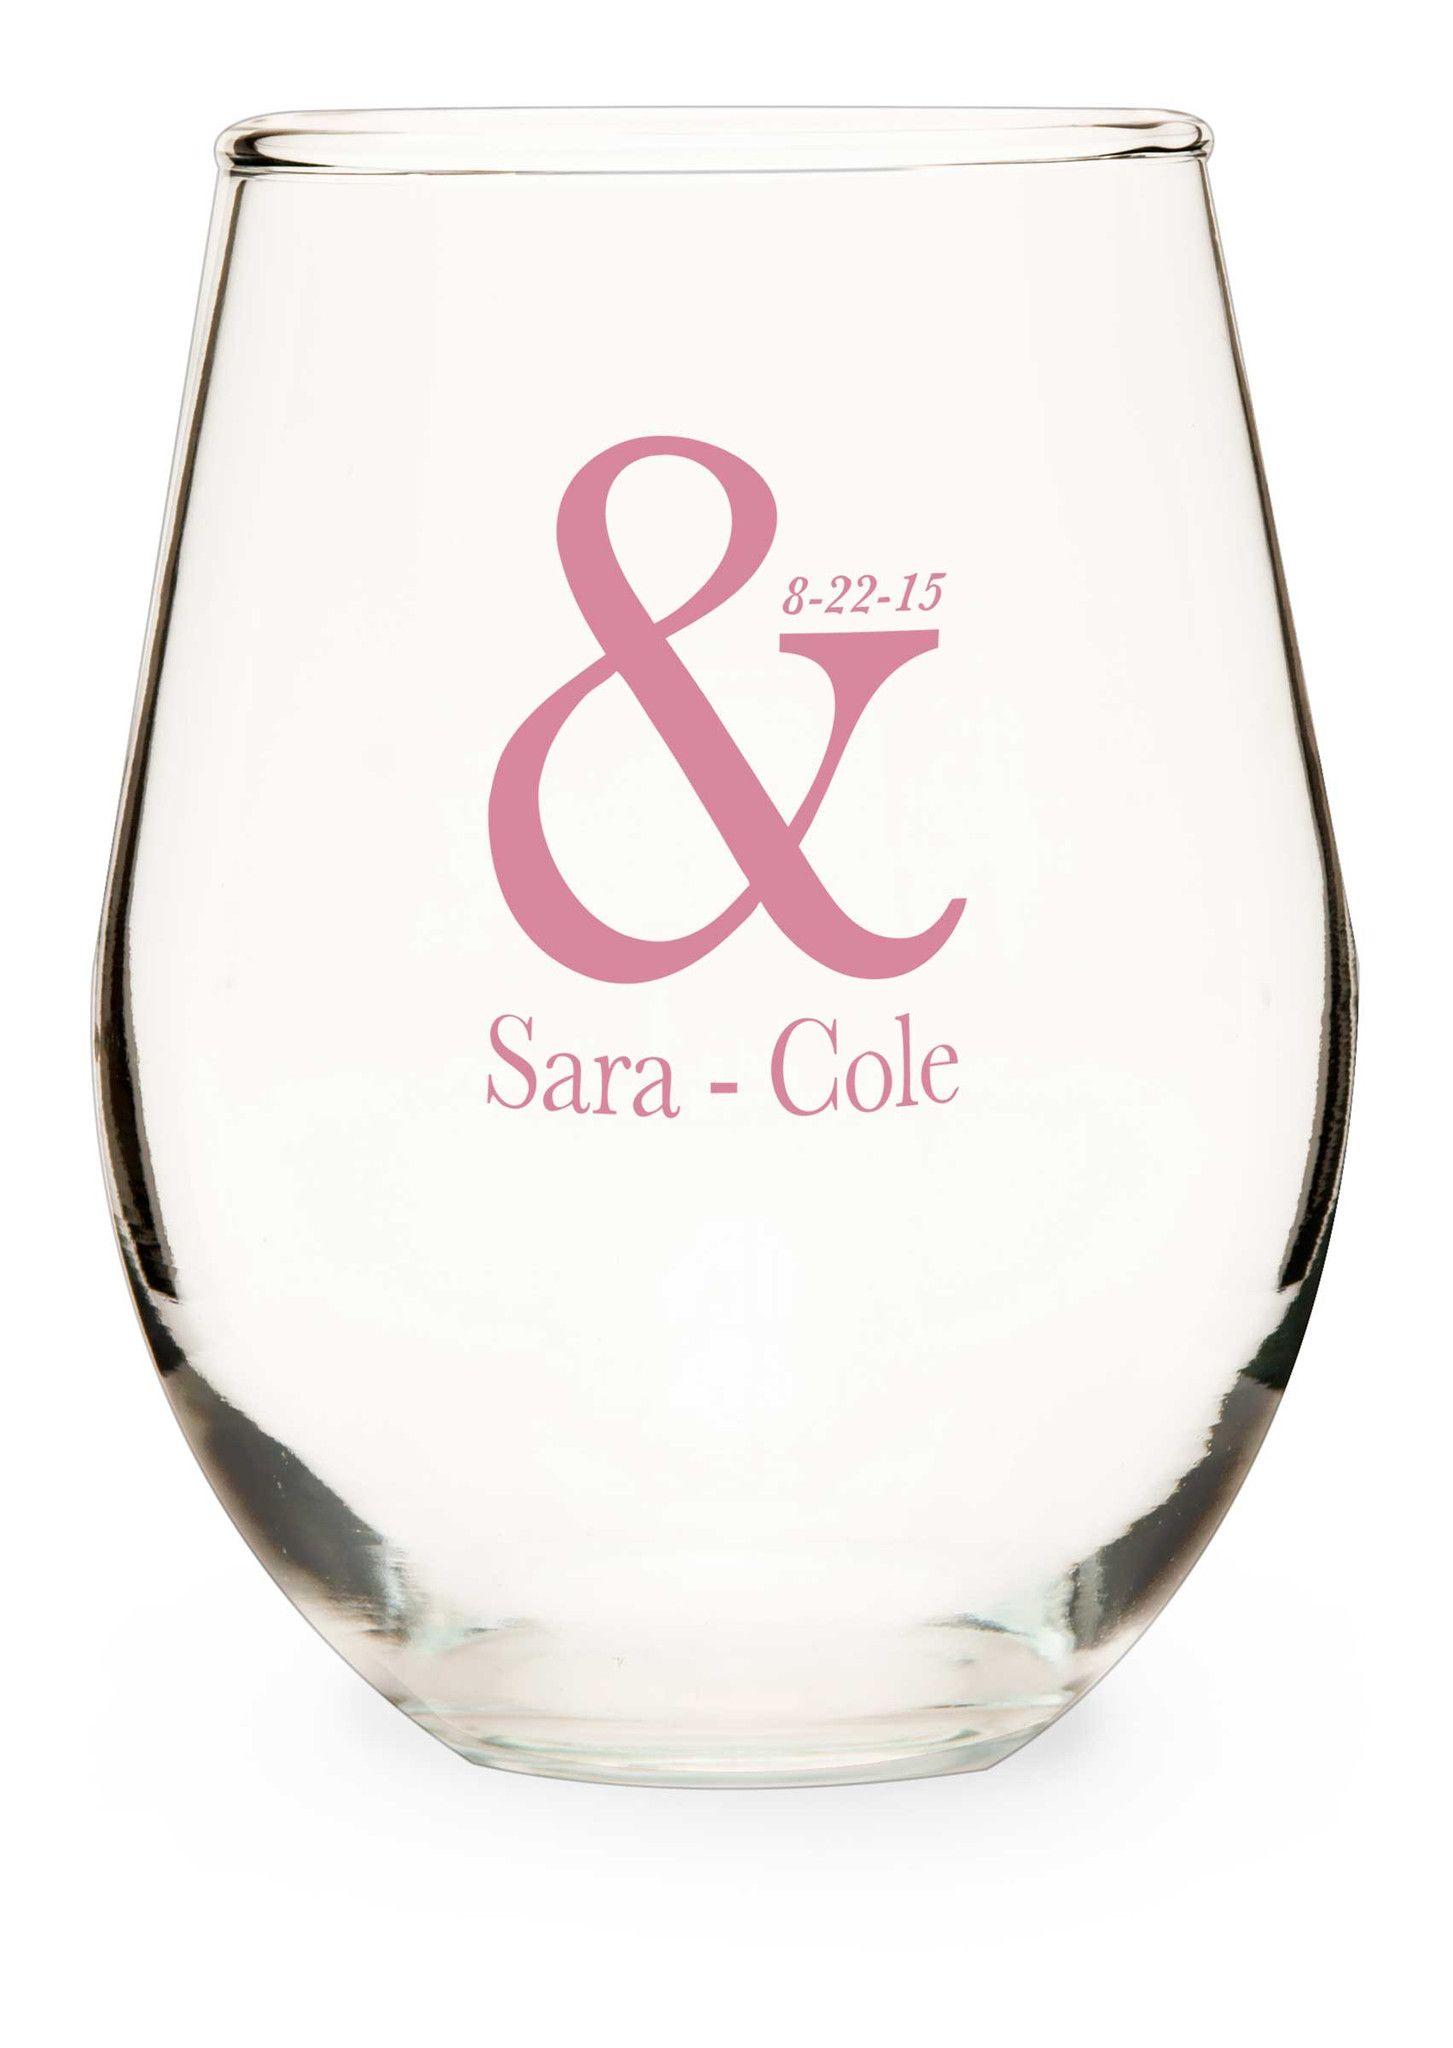 Stemless Wine Glass, wedding candles, wedding glasses, wine  glasses, wedding wine glasses, personalized wine glasses, anniversary glasses, personalized wedding glasses